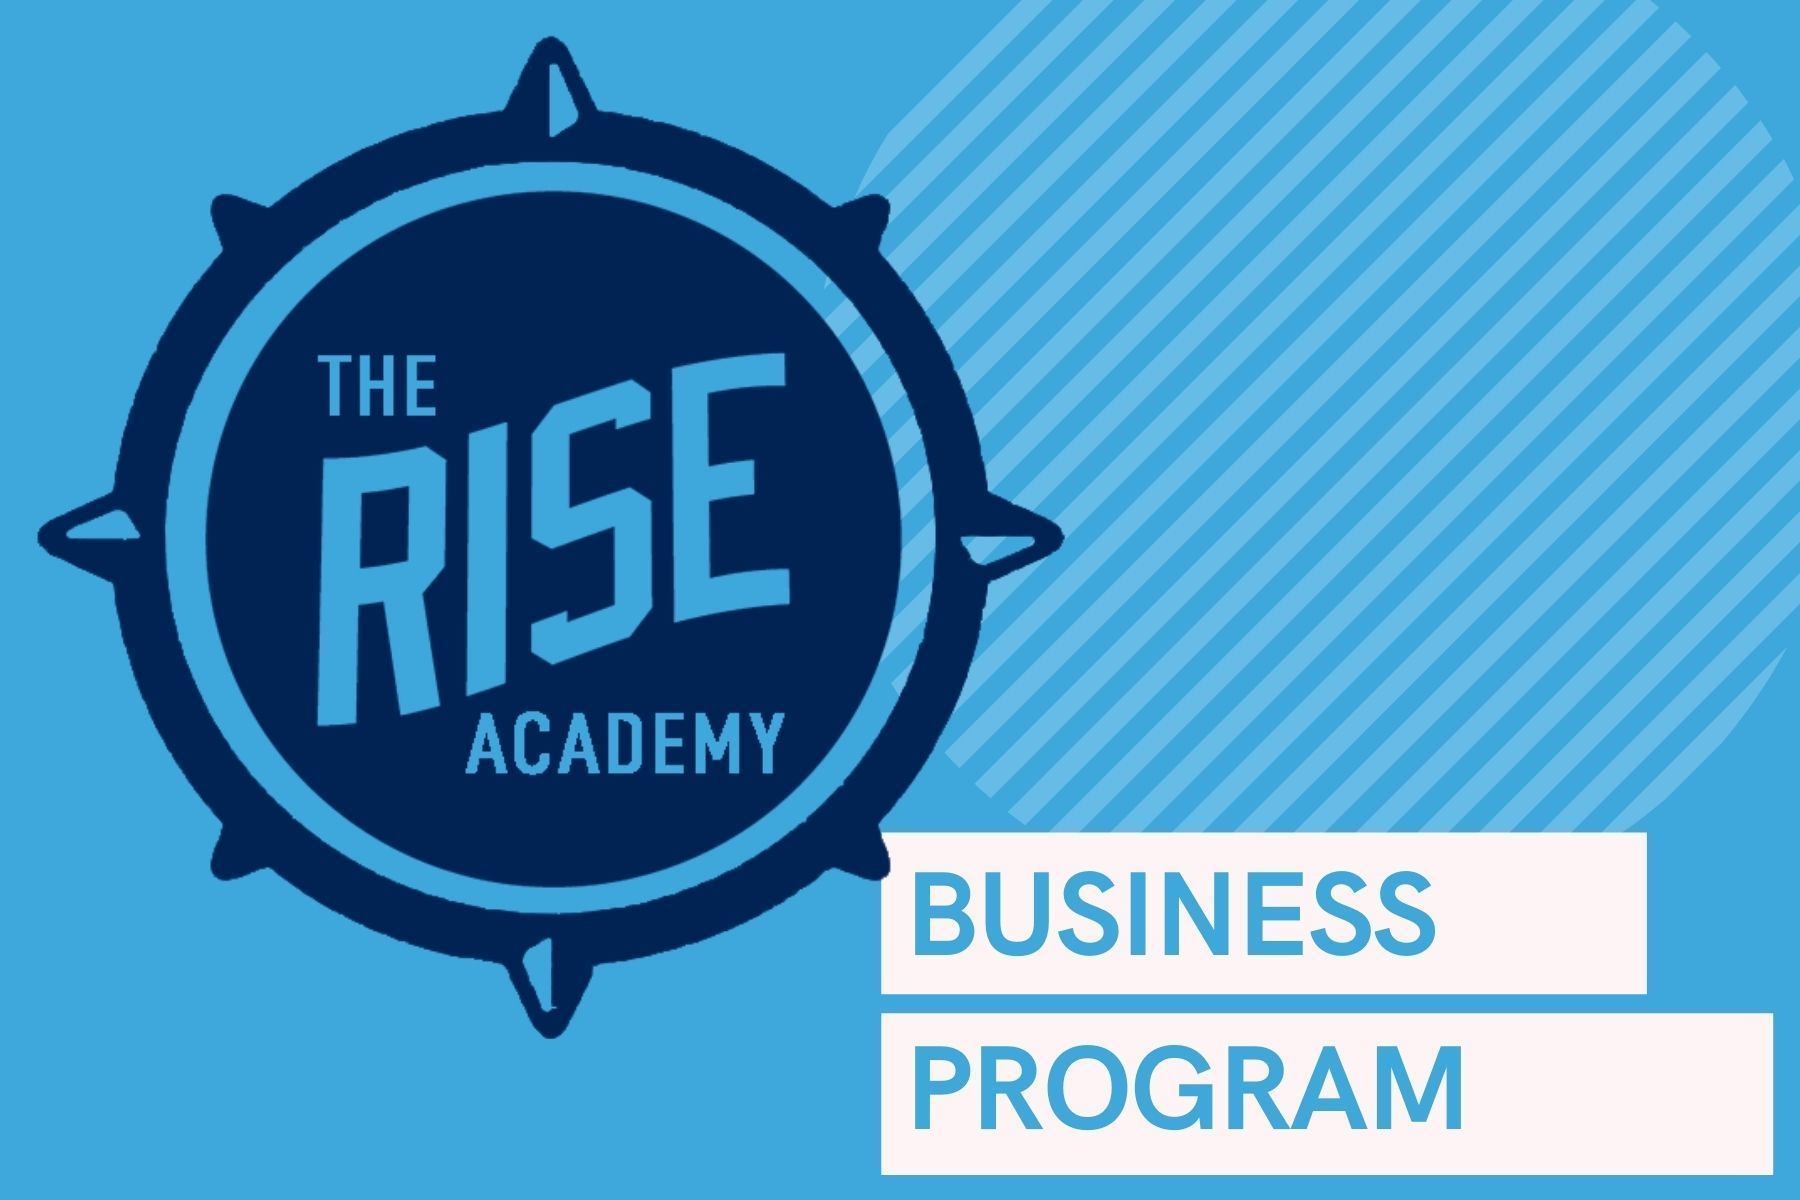 RISE Academy Business Program